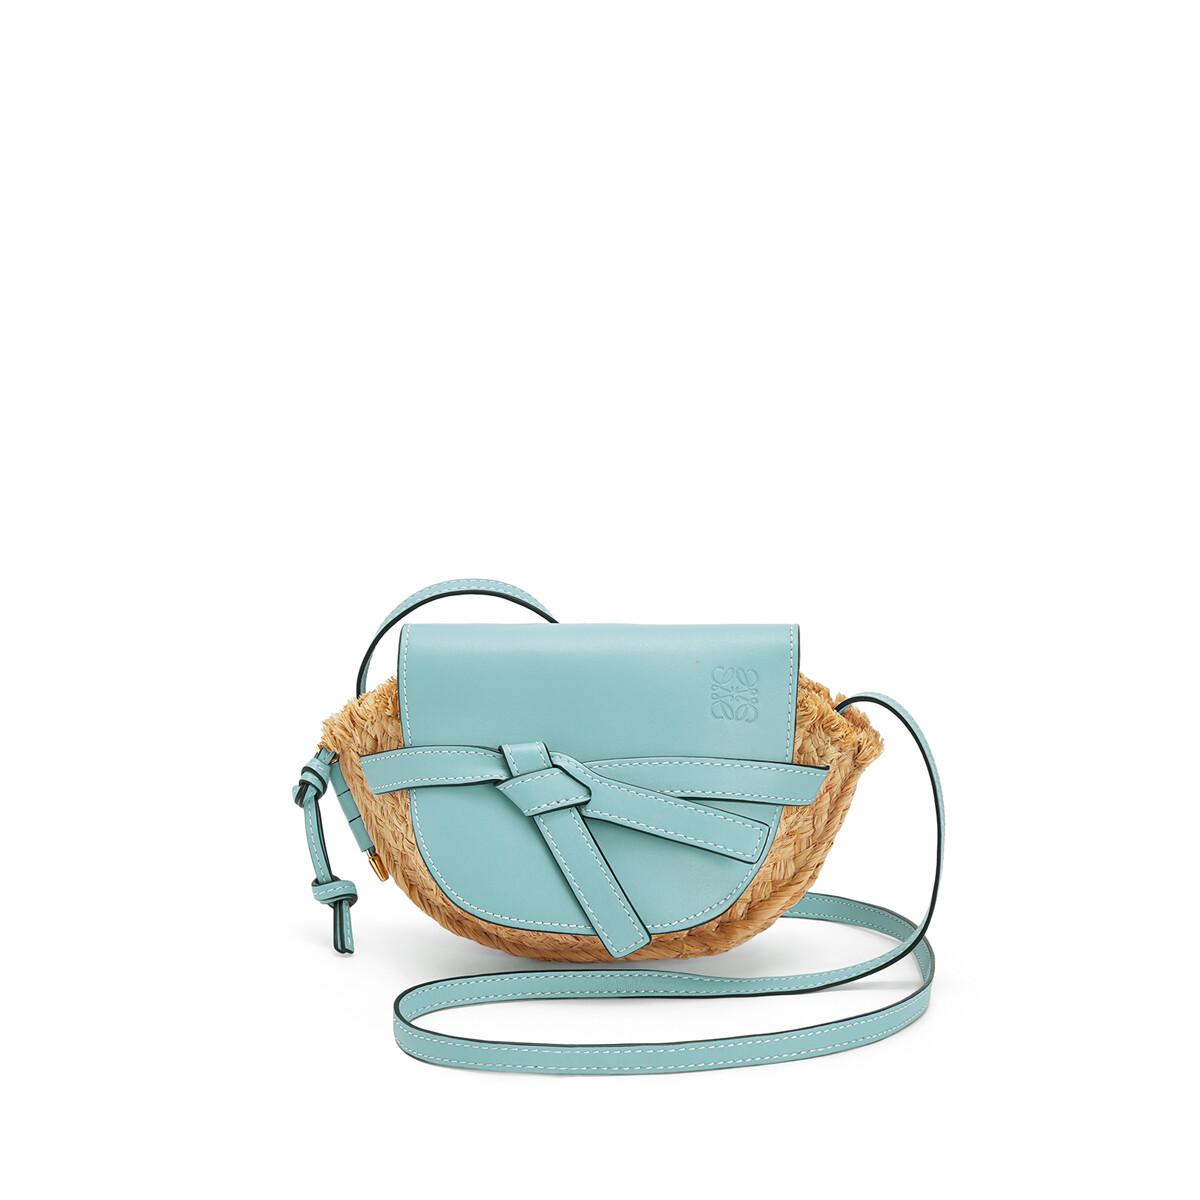 LOEWE Gate Mini Bag Light Blue/Natural front